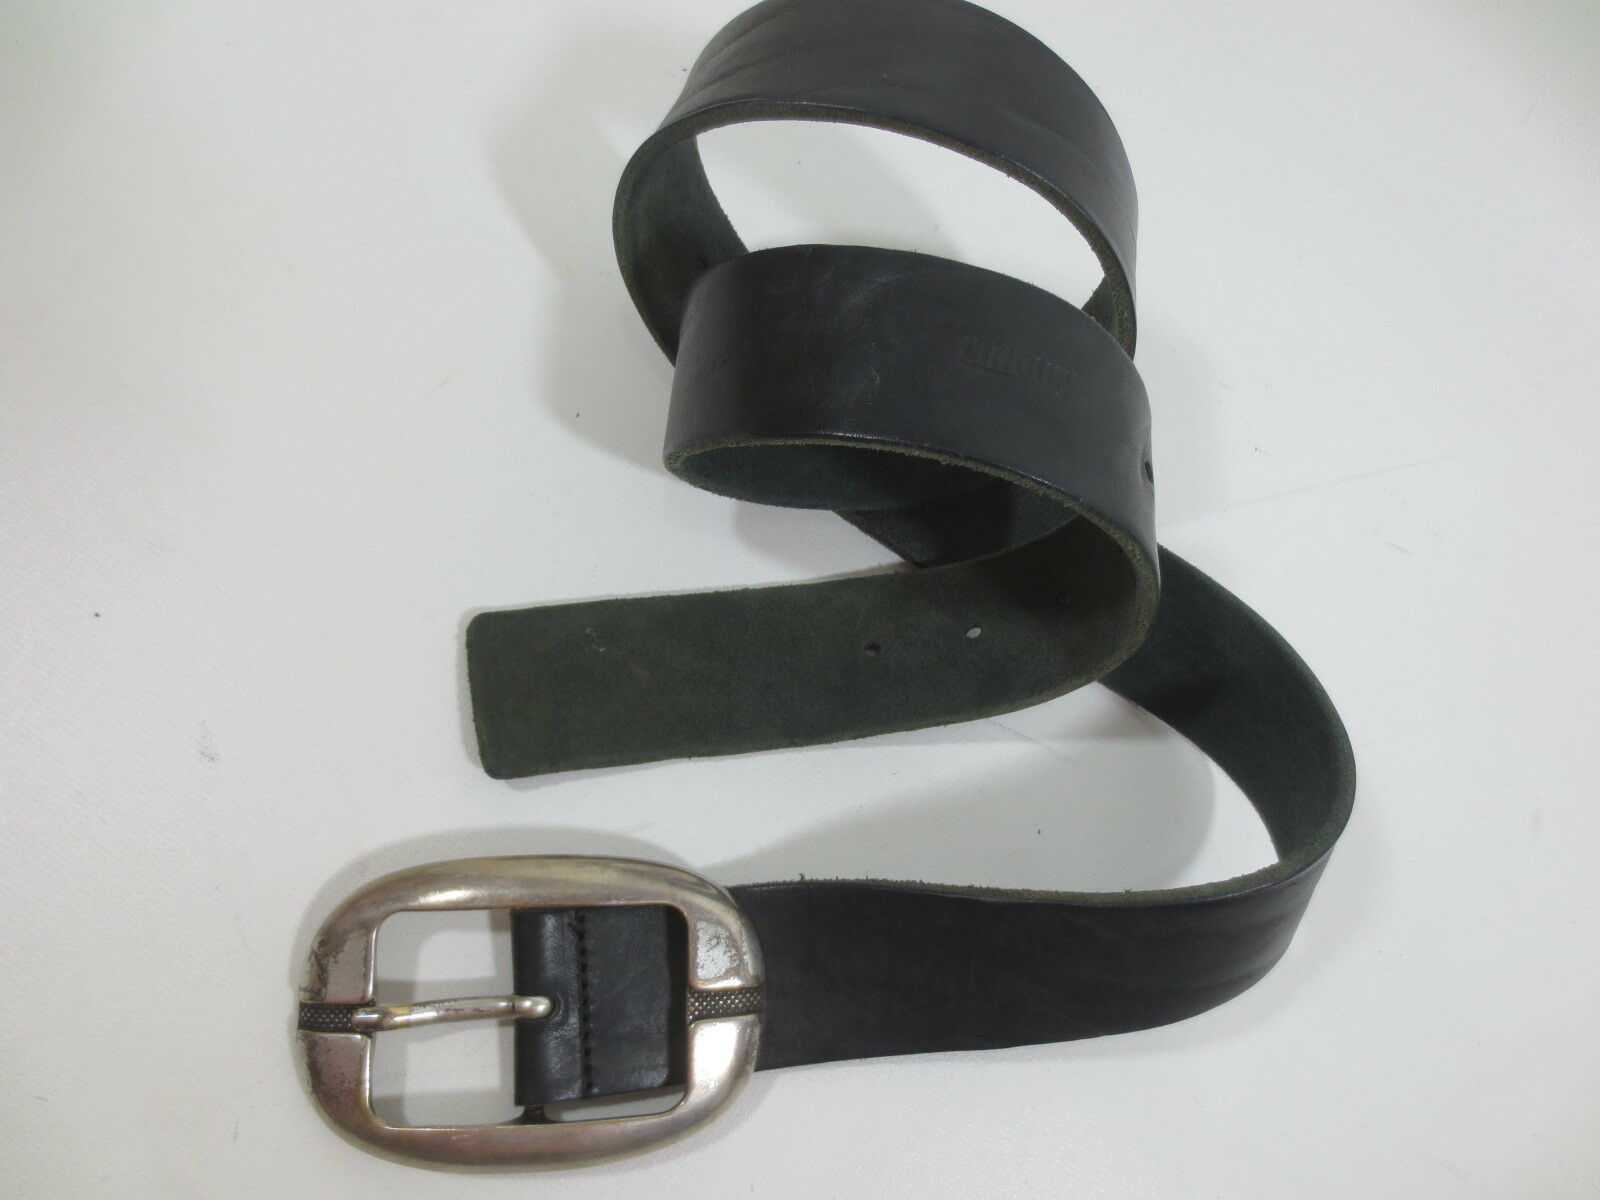 4 cm Gürtel Ledergürtel CINQUE 85 90 95 Leder schwarz vintage /X9